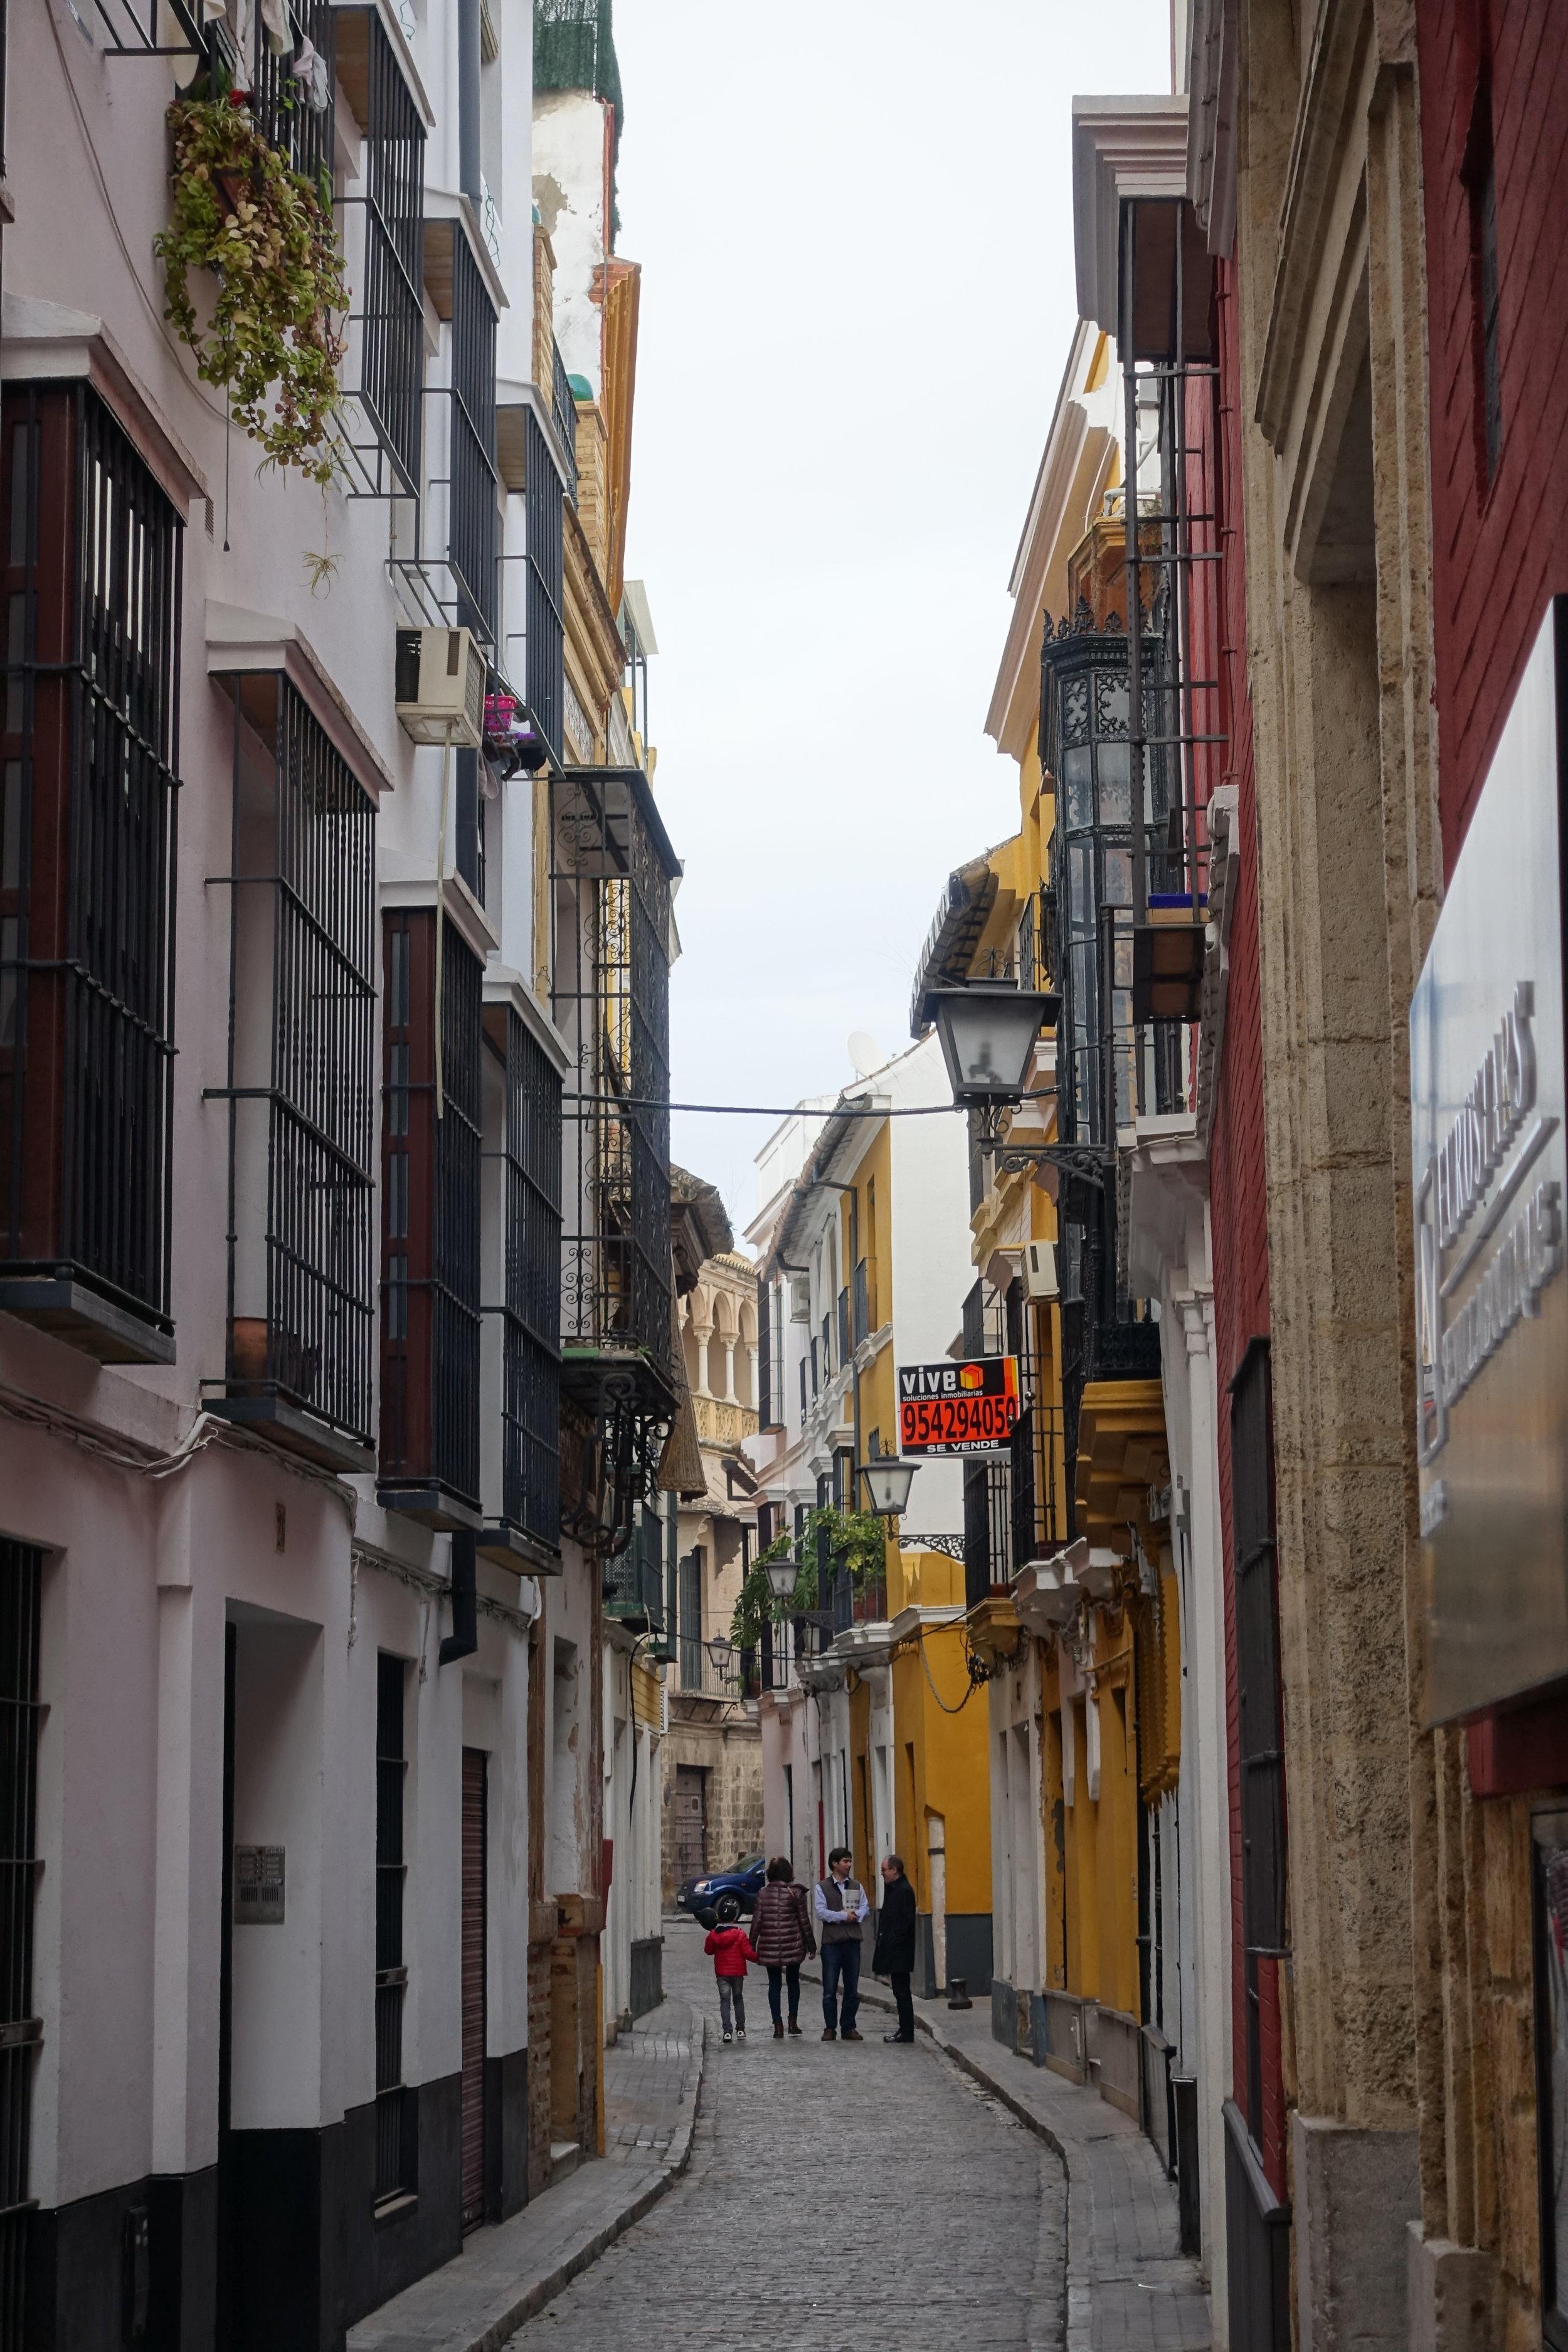 Jewish Quarter in Seville